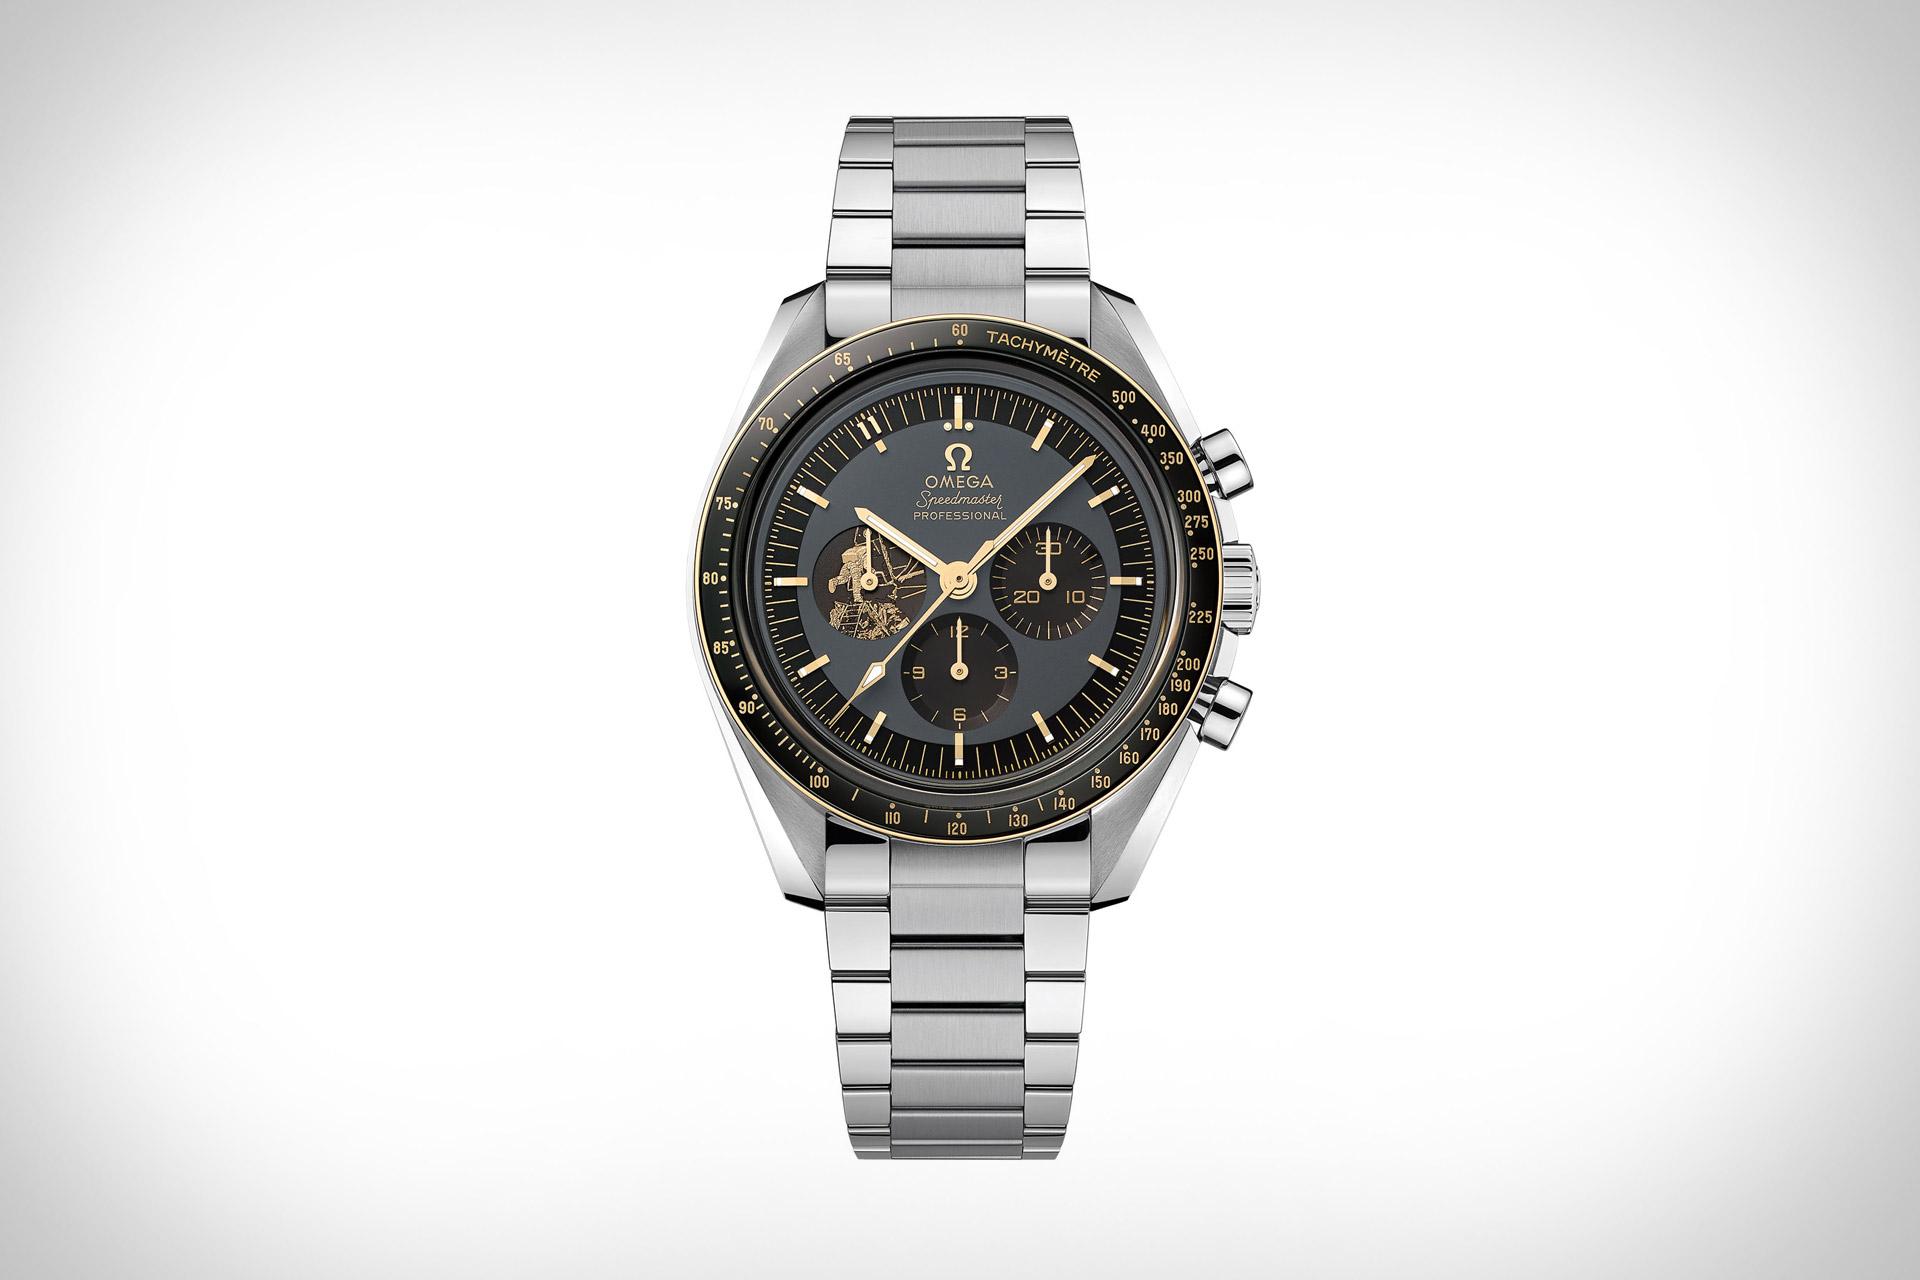 Omega Speedmaster Professional Apollo 11 50th Anniversary Watch